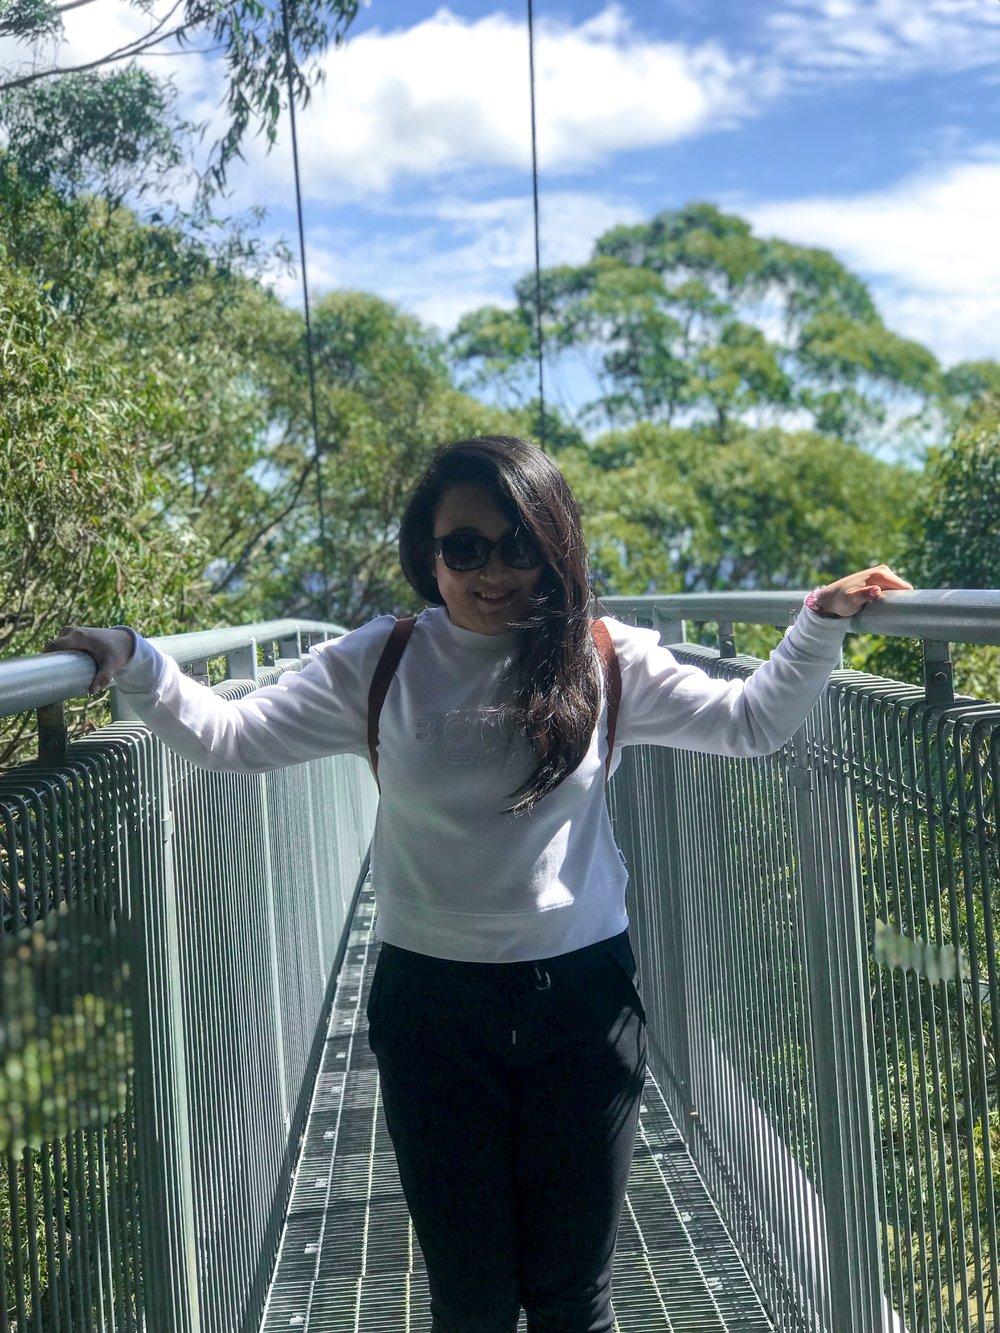 Things To Do in Shellharbour, Illawarra Fly Treetop Walk3.JPG